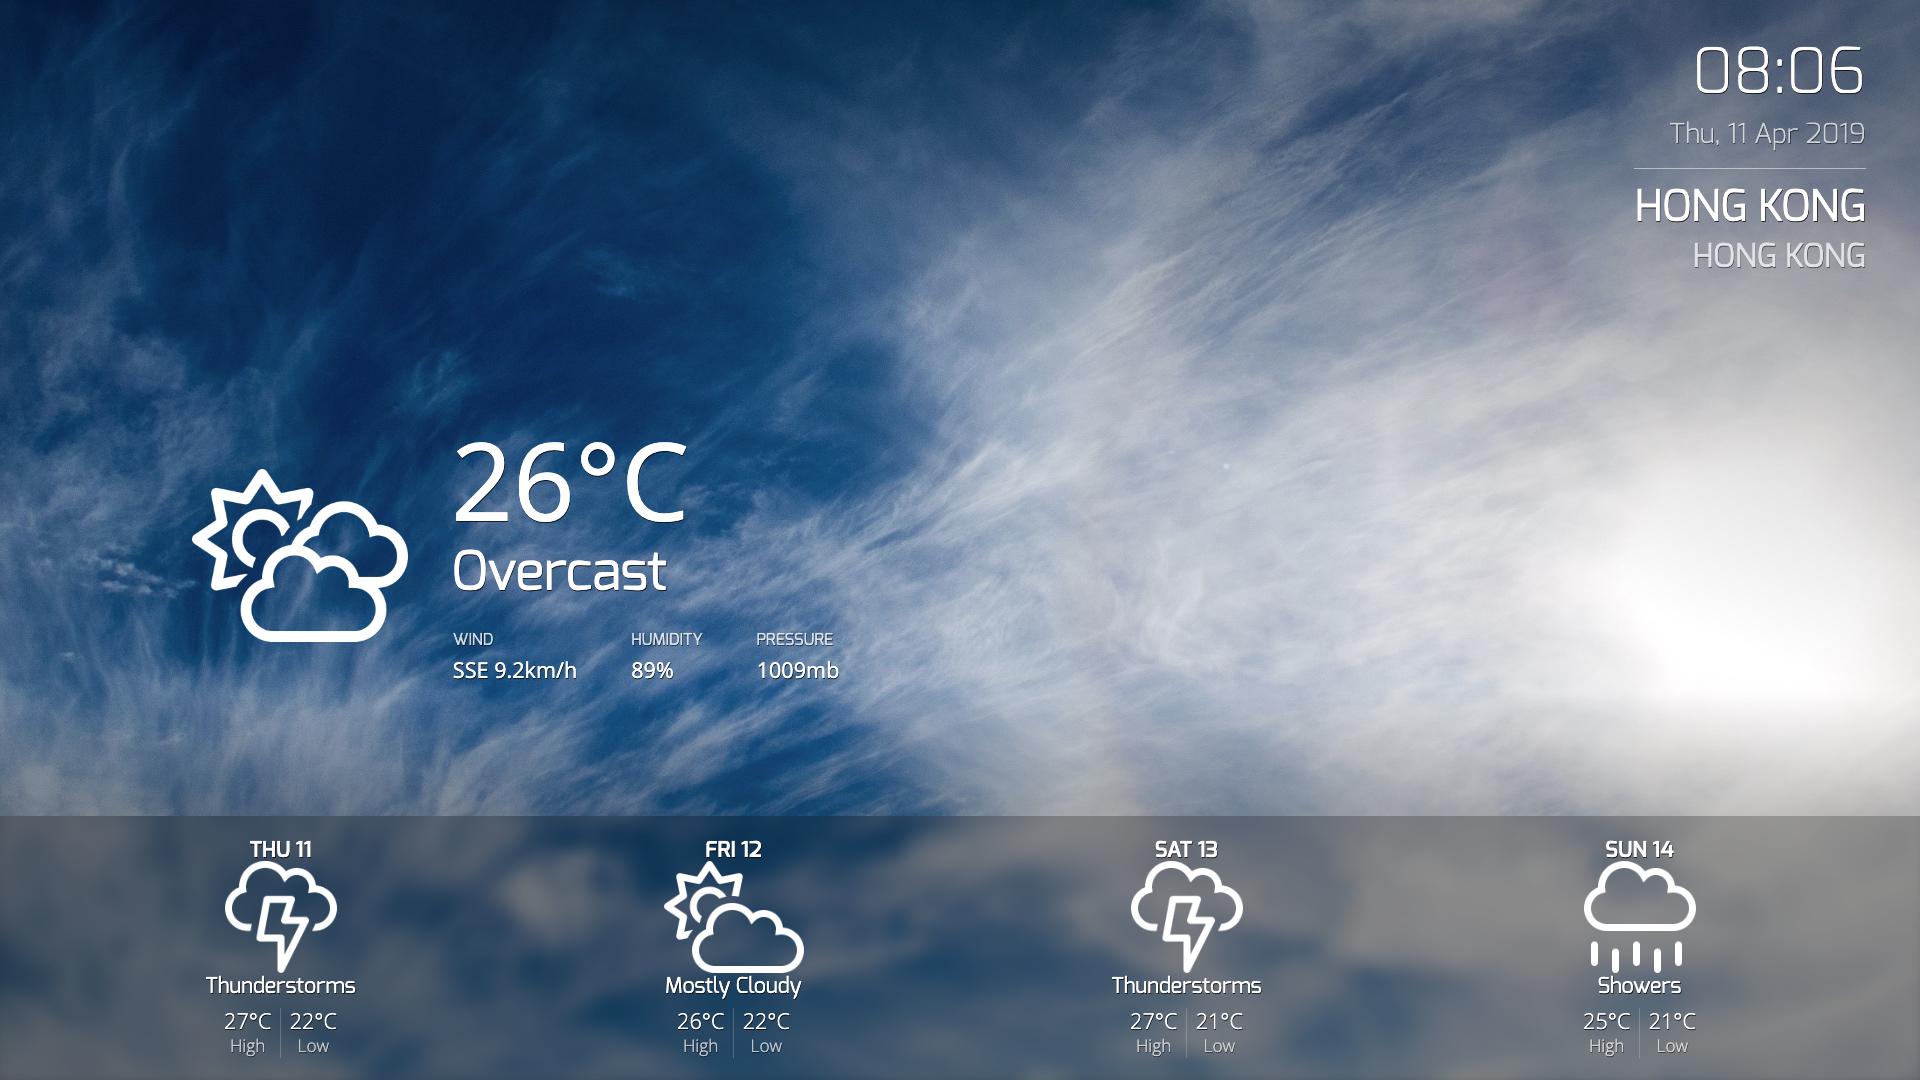 Weather App for Digital Signage image carousel